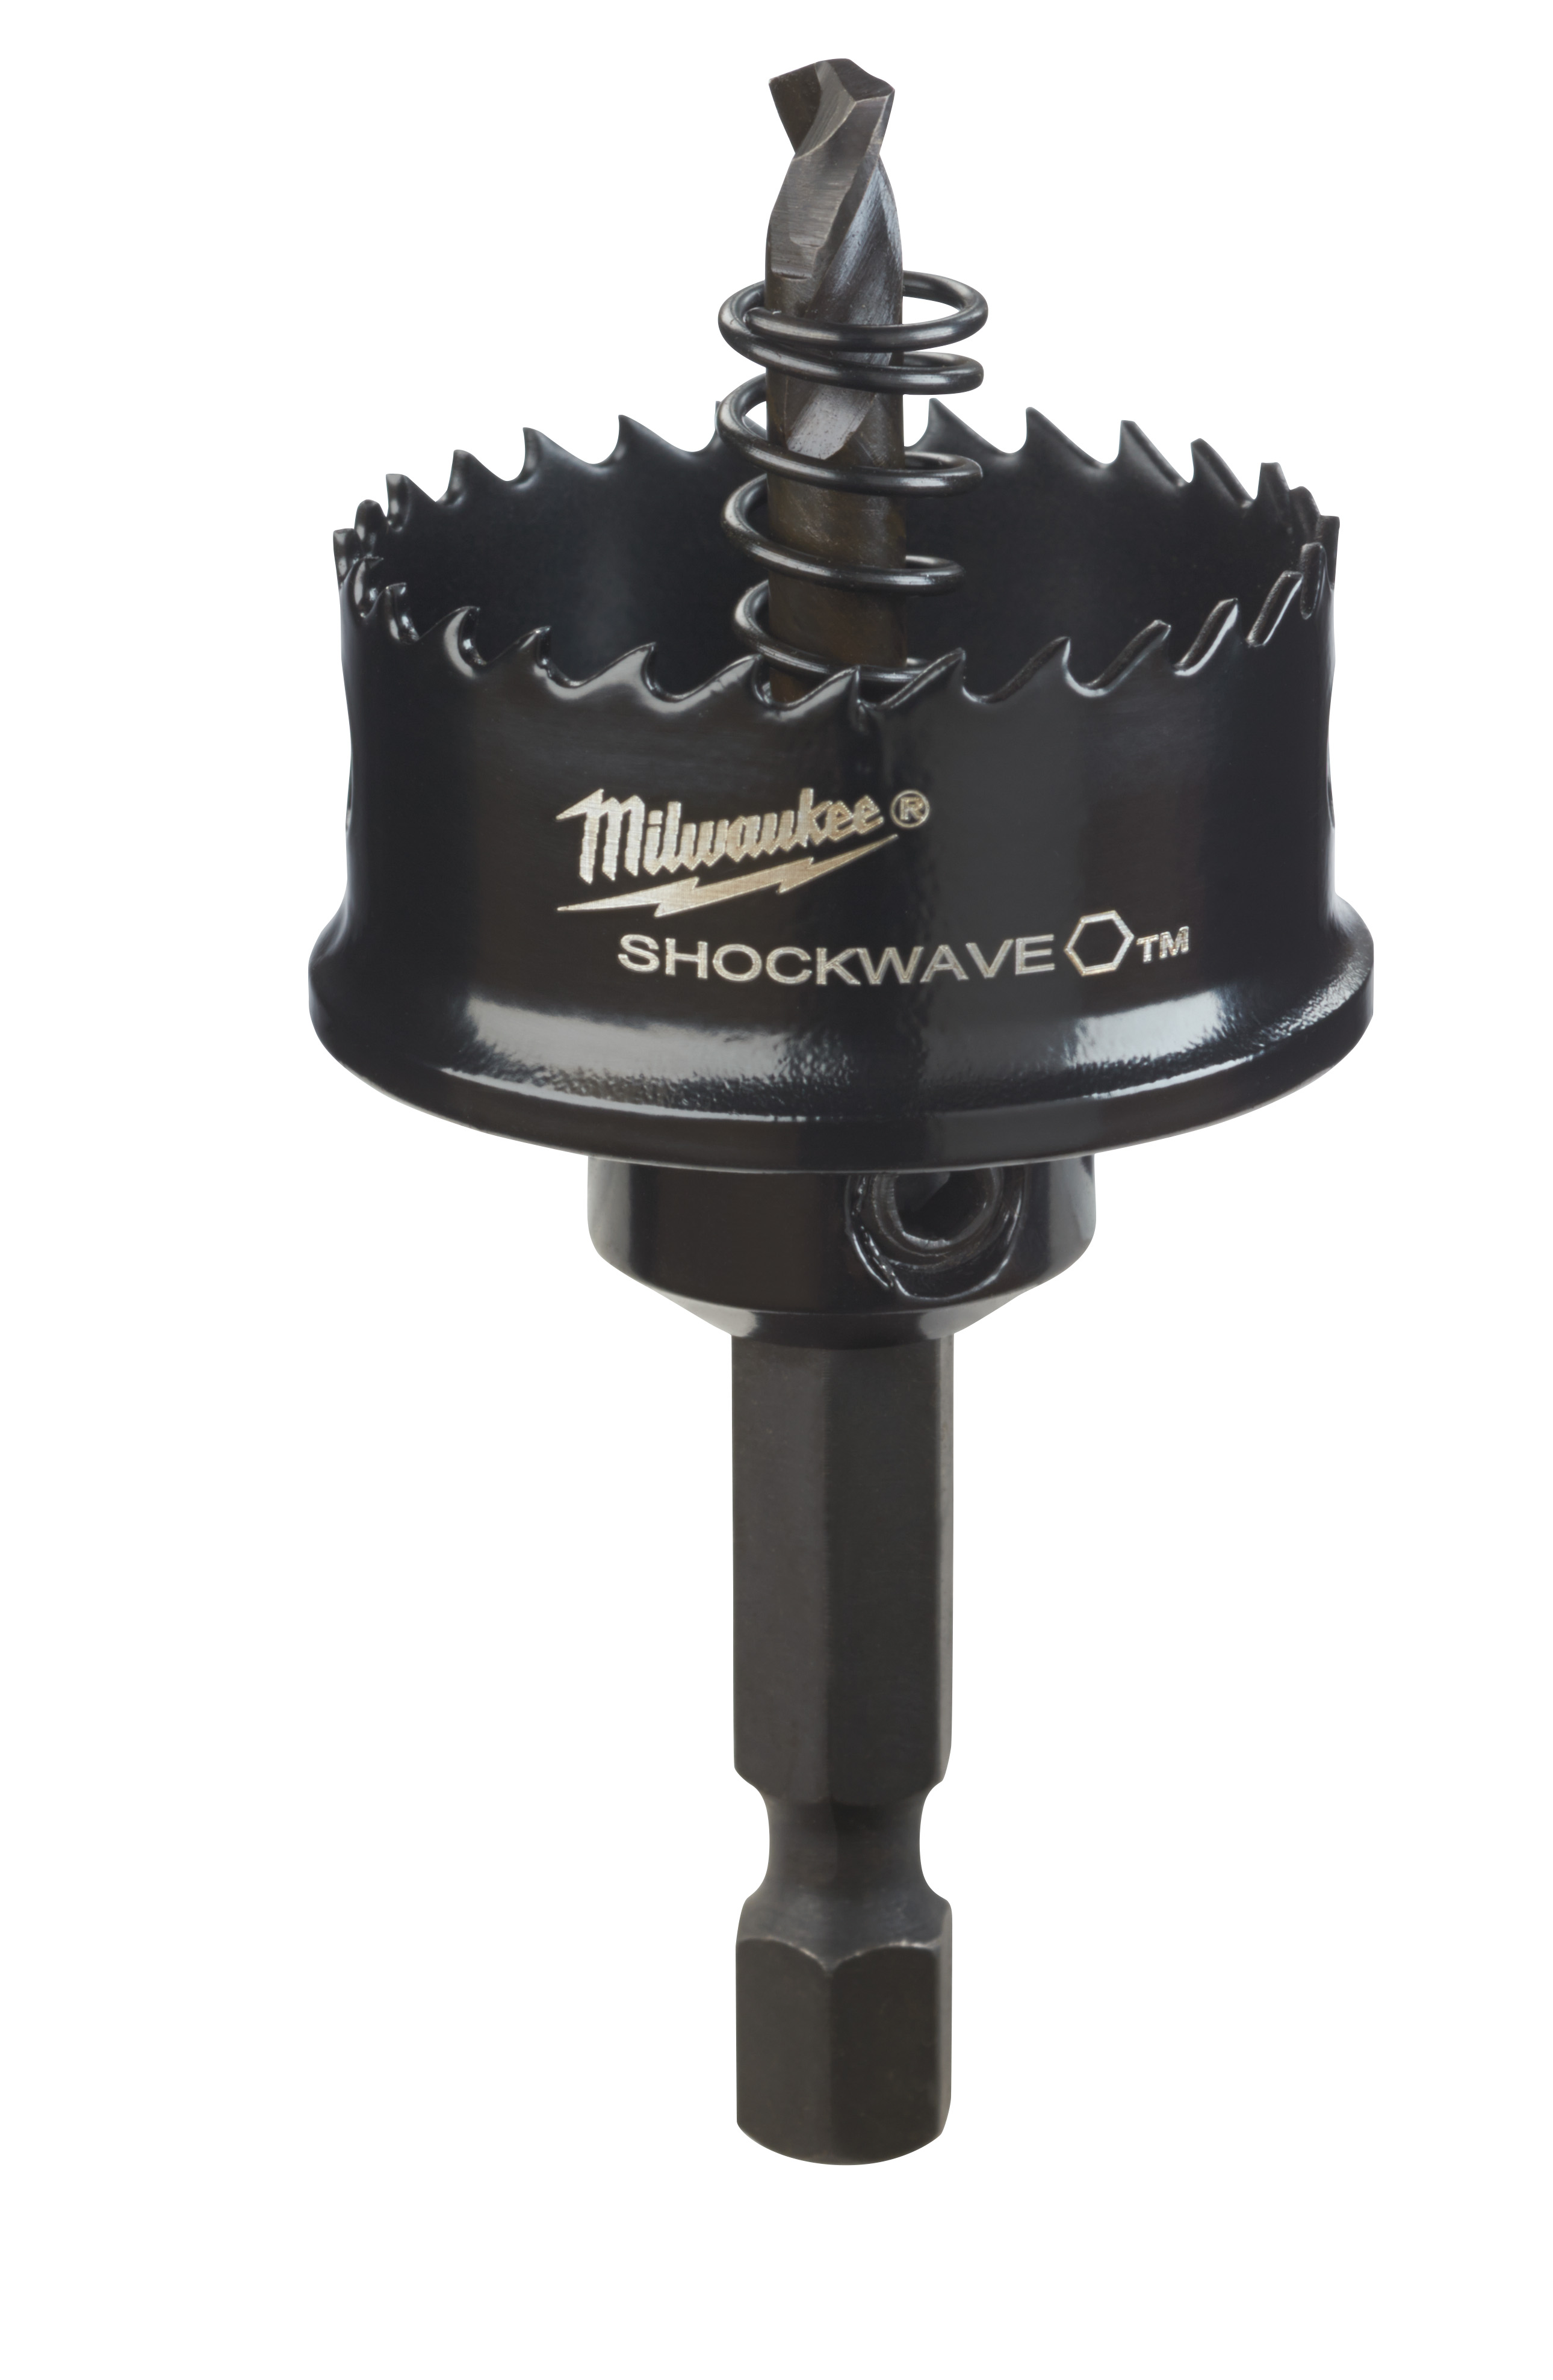 "Milwaukee 49-56-9820 1-1/8"" Shockwave™ Thin Wall Impact Hole Saw"